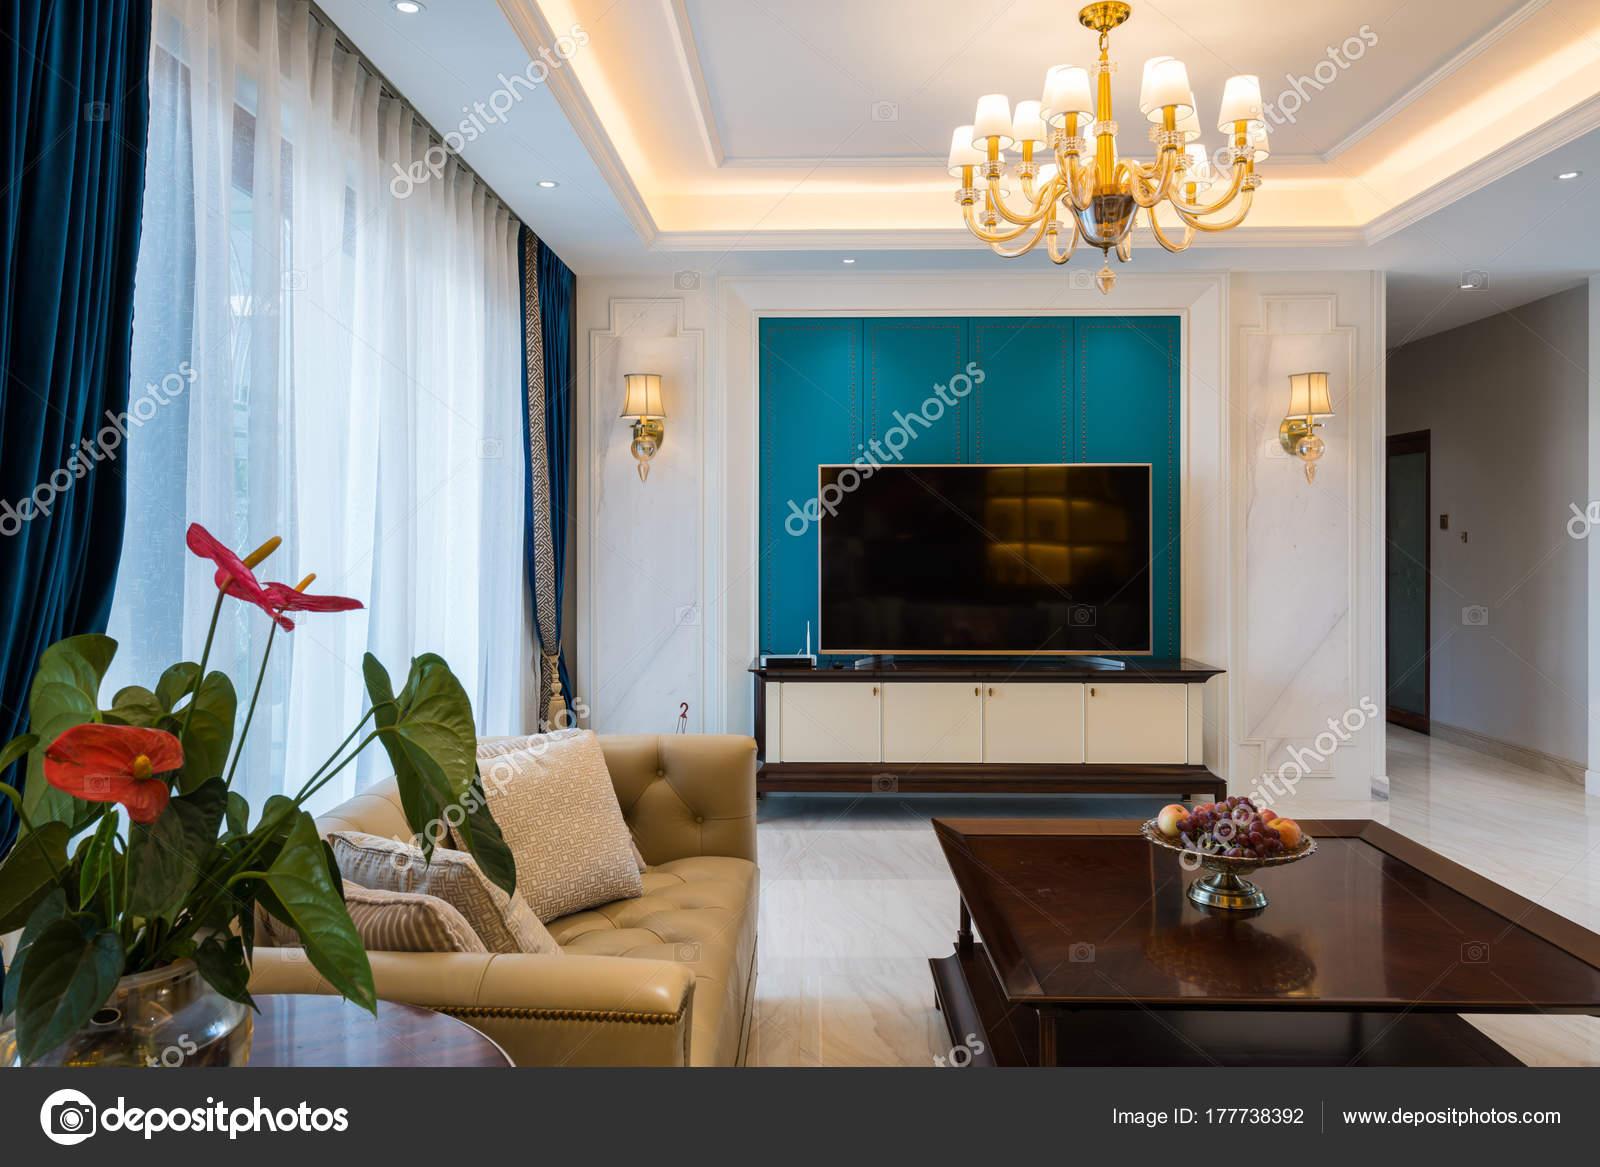 Haus Innen Mit Luxus Dekoration — Stockfoto © roseburn3djob #177738392